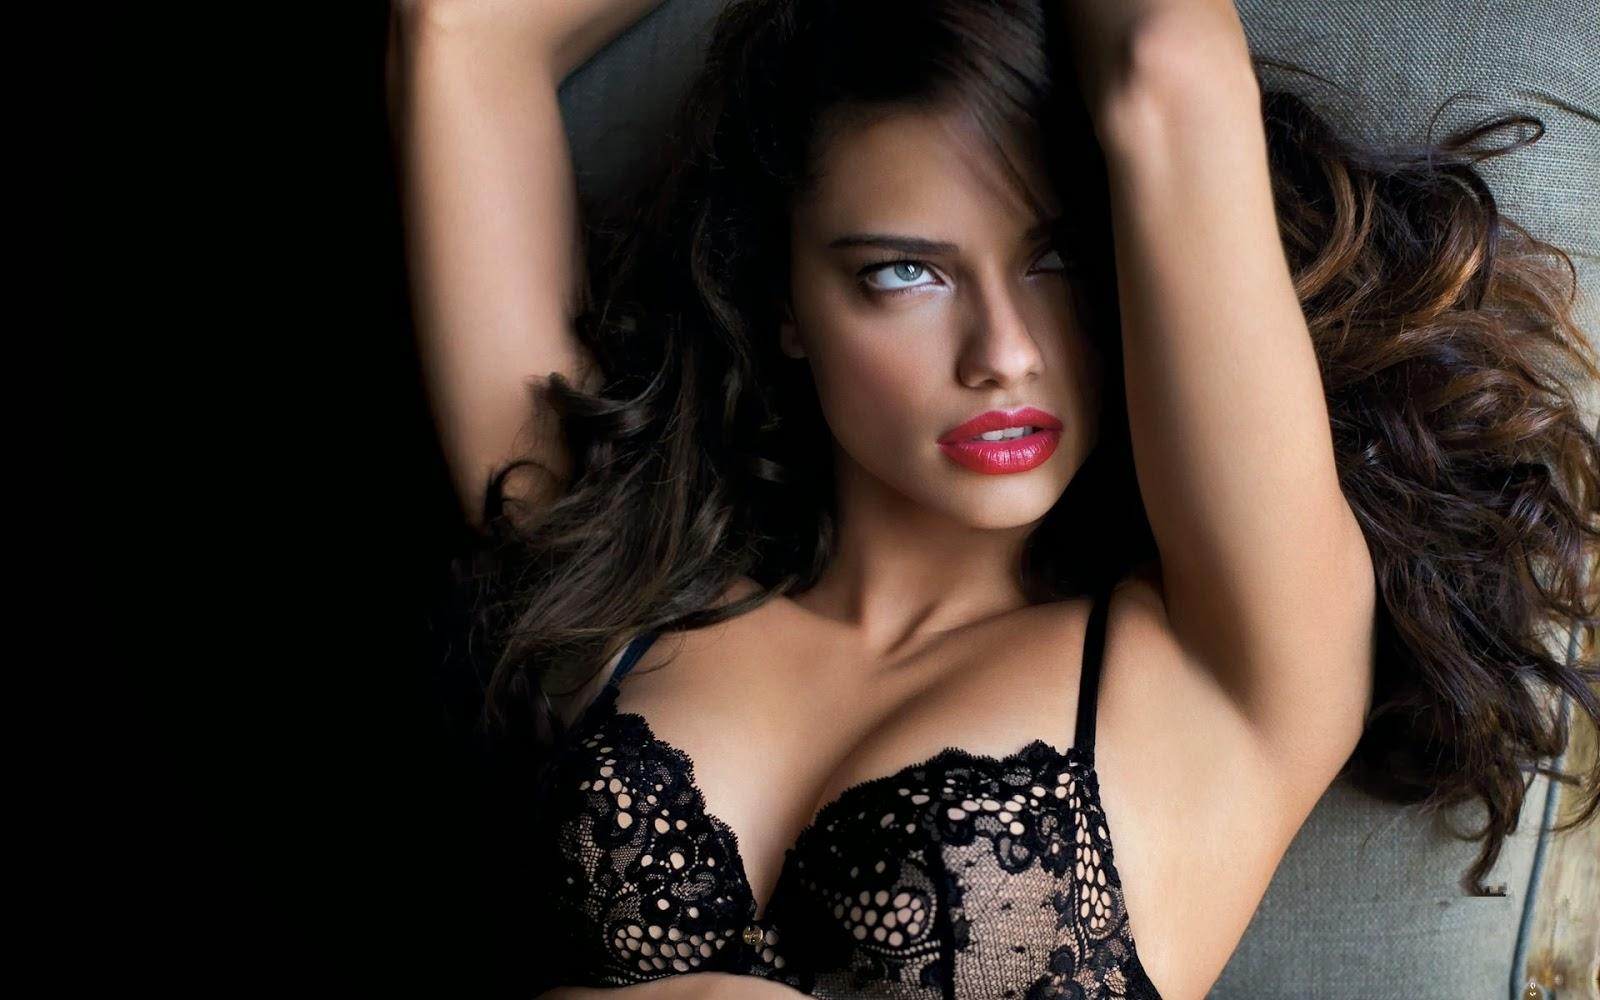 b03911de309 my magazine: Ο μελαχρινός ''άγγελος'' της Victoria Secret Adriana ...